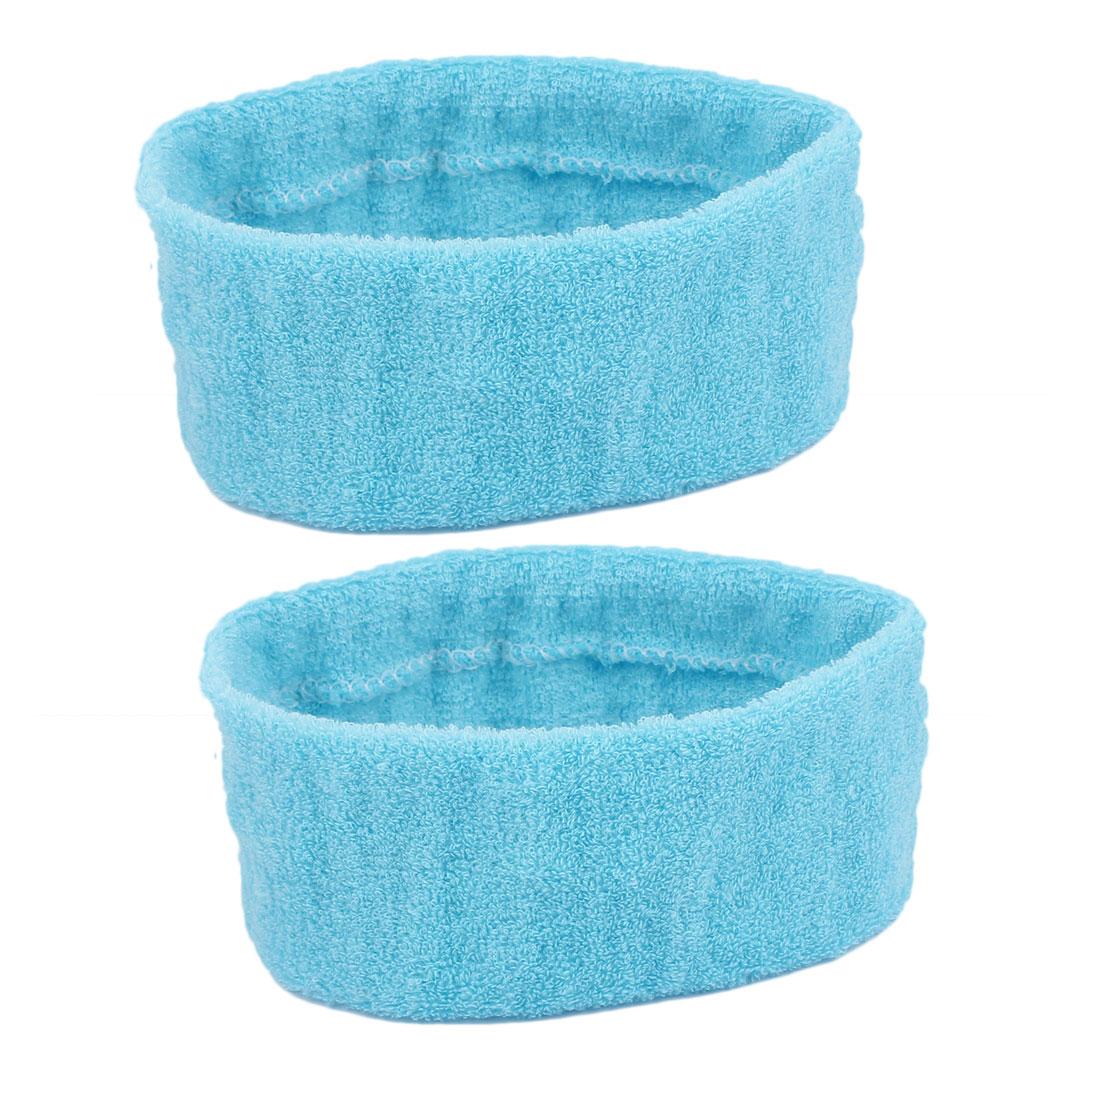 Outdoor Sports Tennis Yoga Washable Elastic Sweatbands Head Hair Bands Sky Blue 2 Pcs